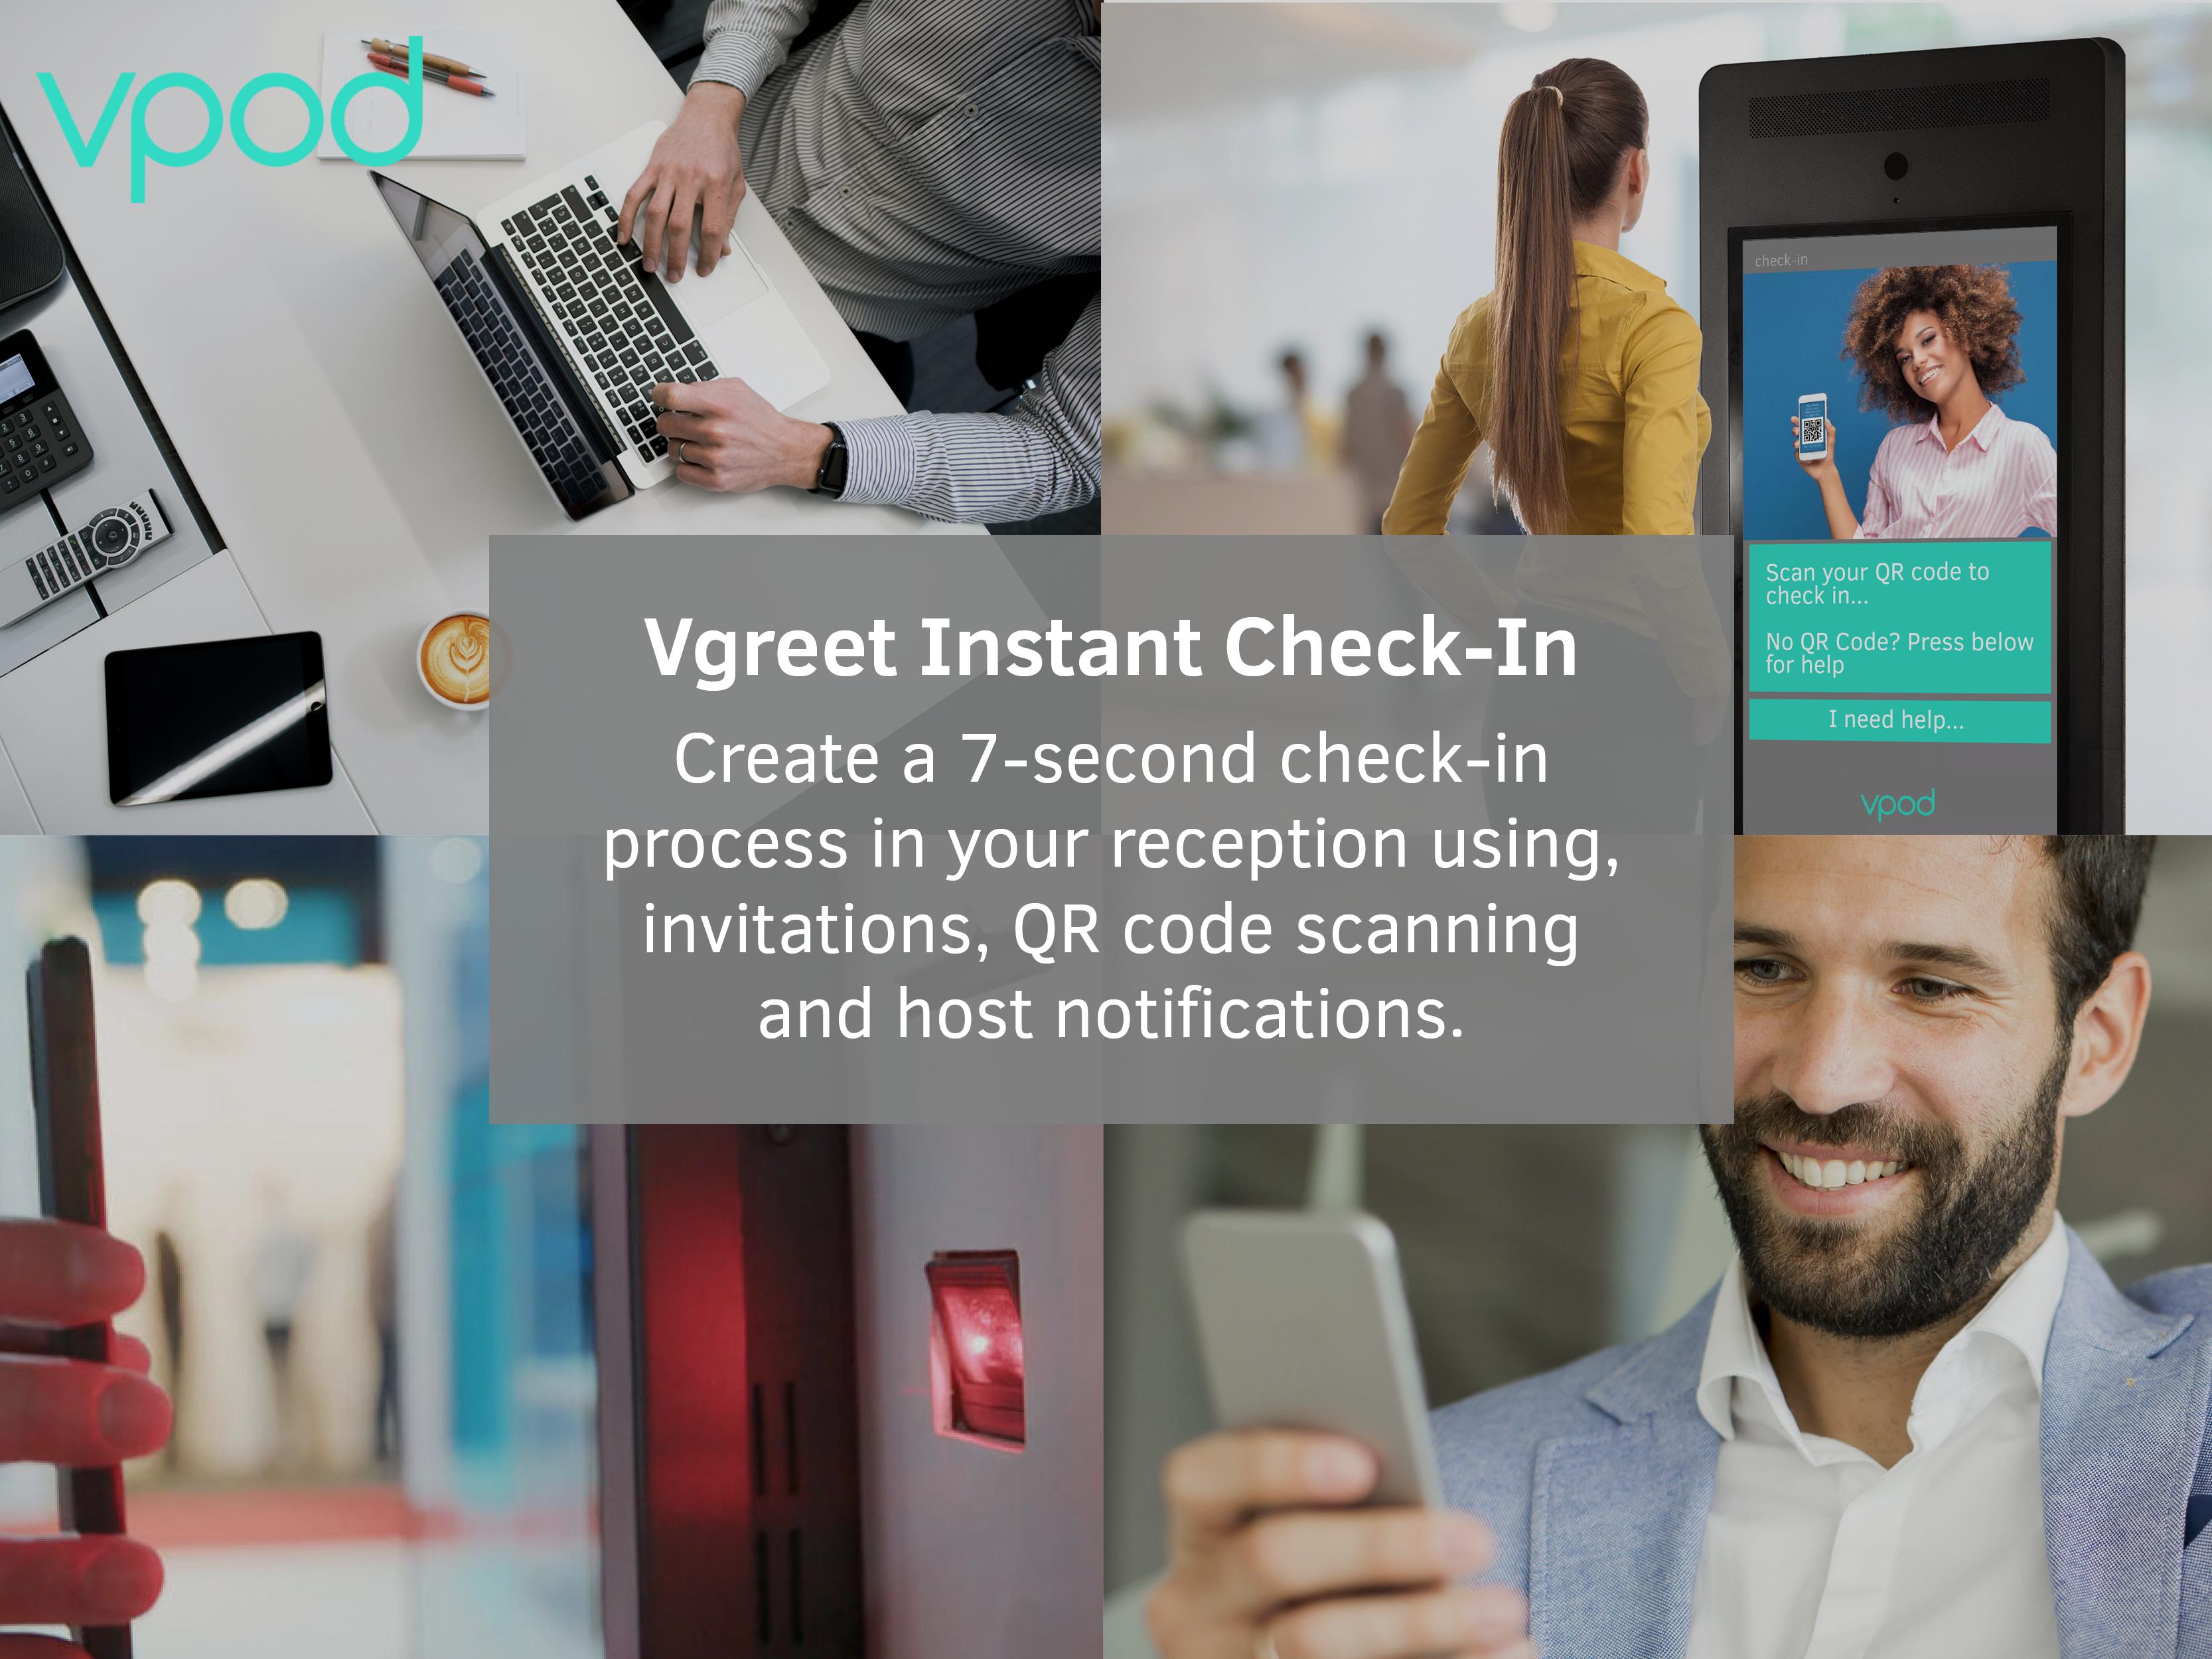 vgreet_instant_checkin